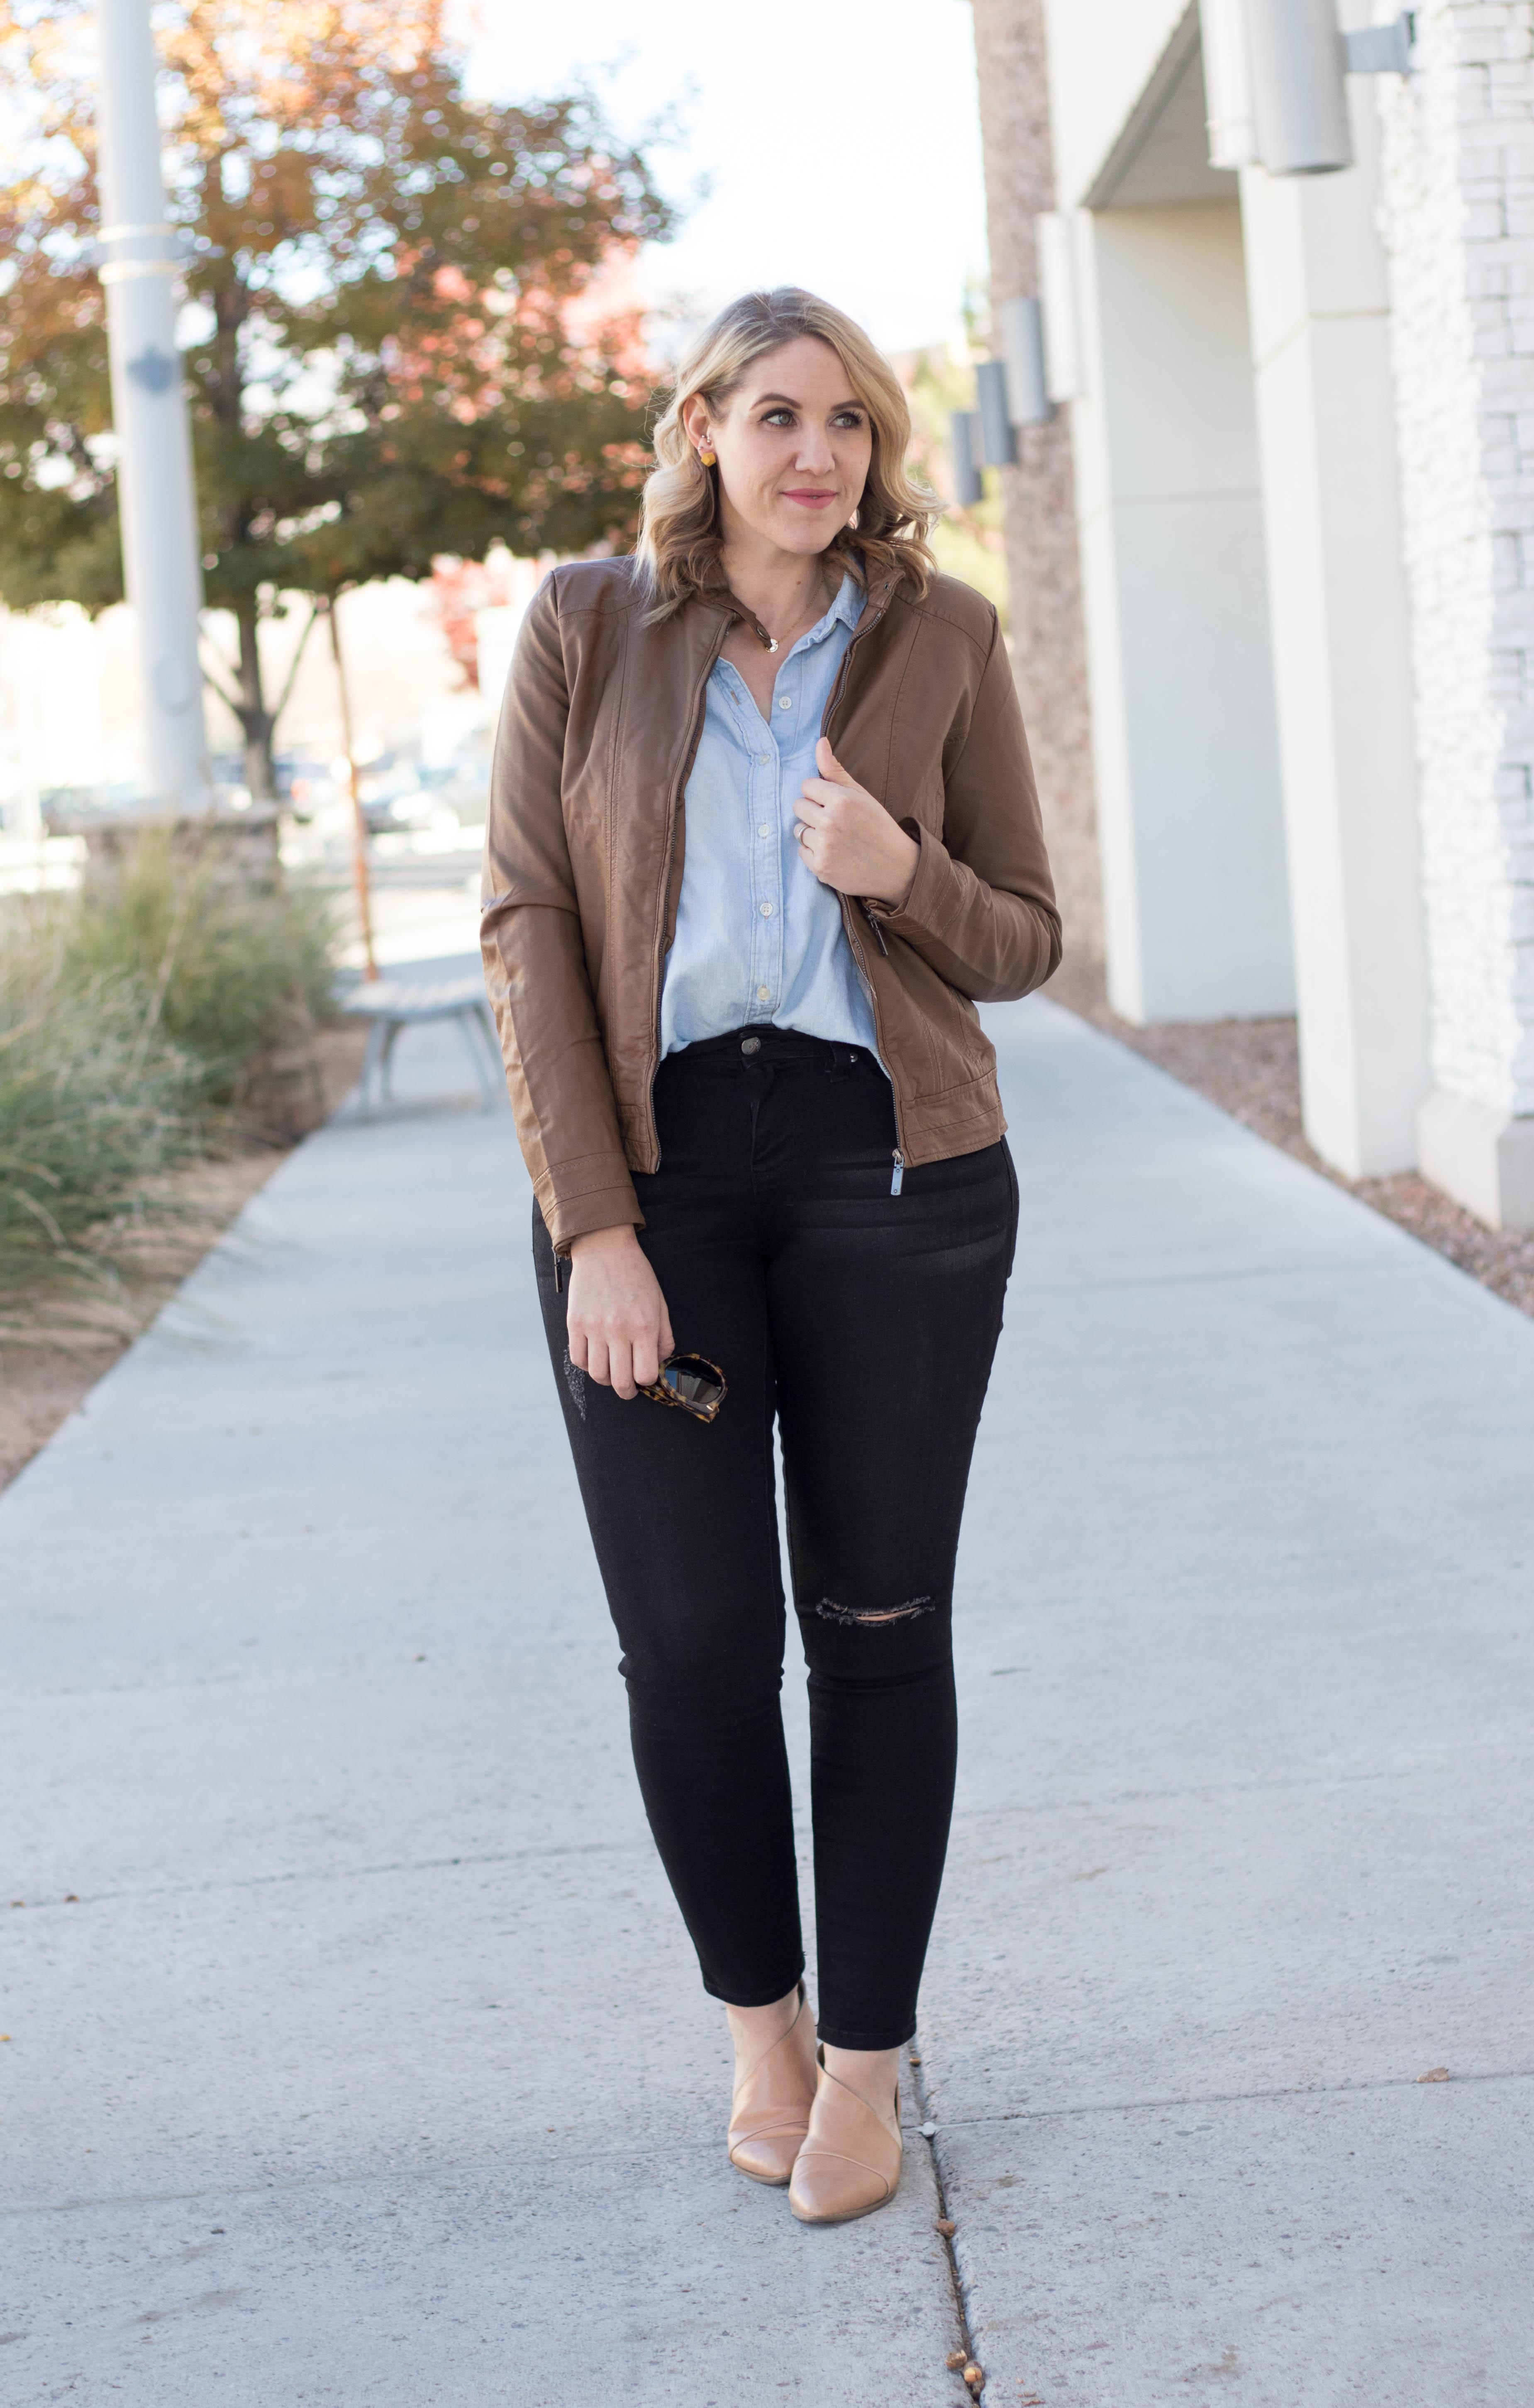 how to style a bomber jacket #bomberjacket #fallfashion #jeansoutfit